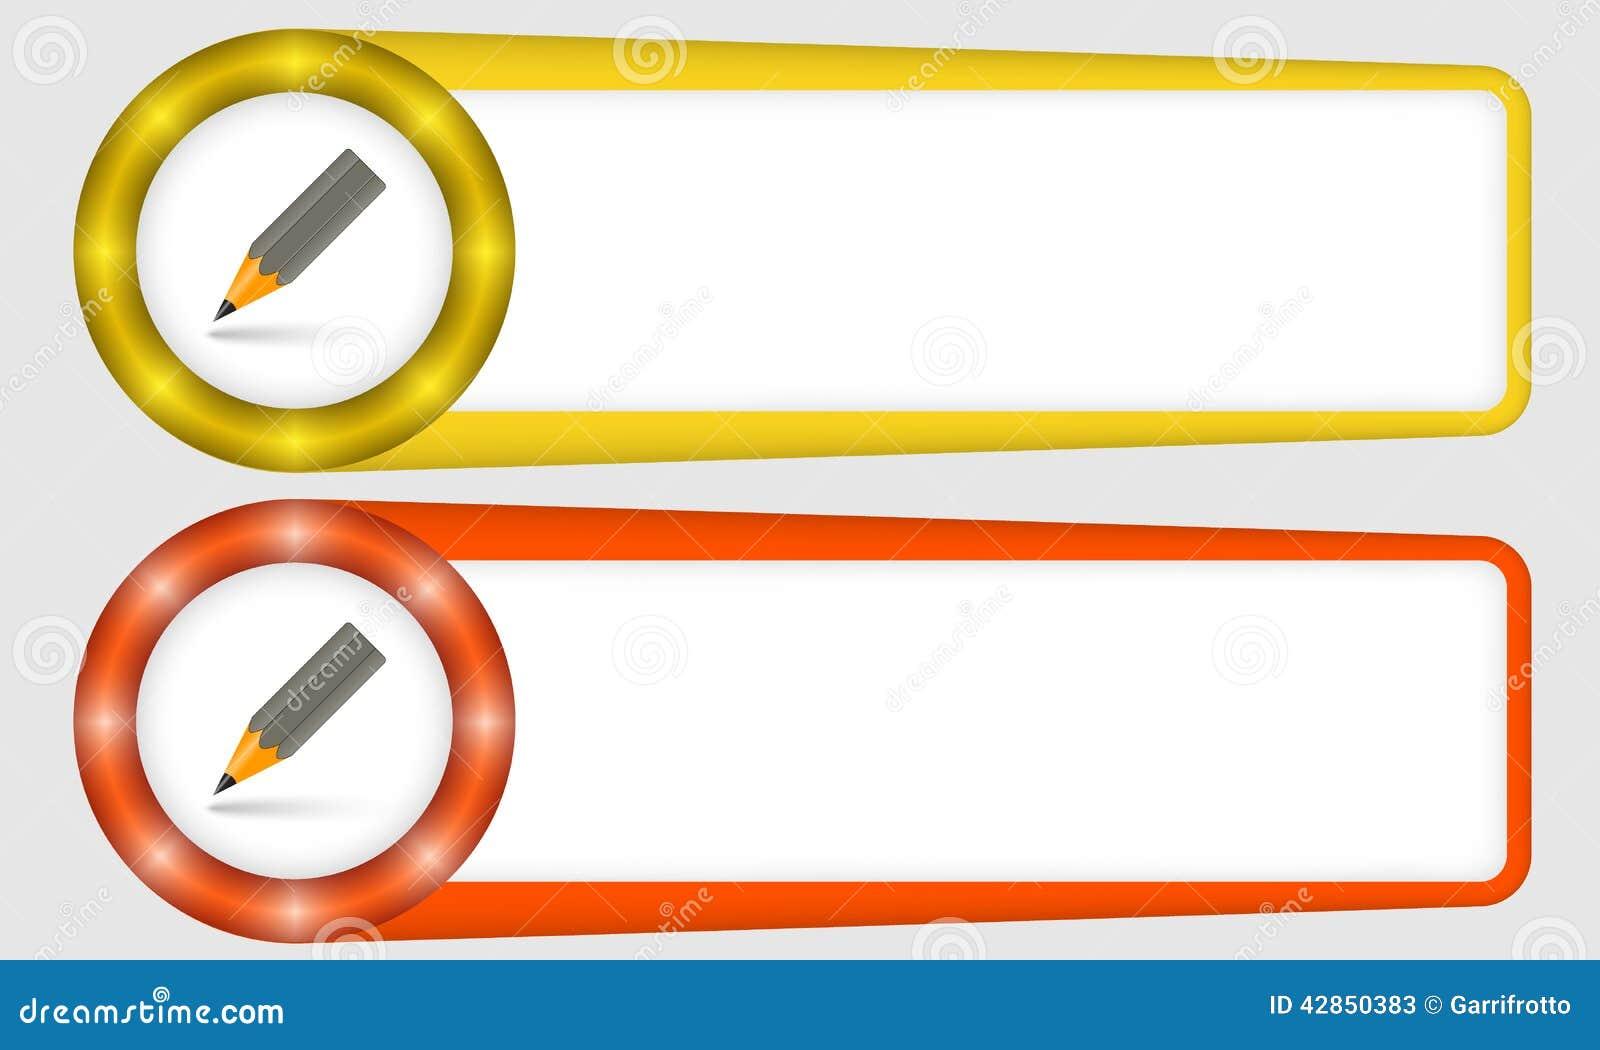 fa0b34073f14ff http://cartoondealer.com/image/42850007/old-time.html http://thumbs ...